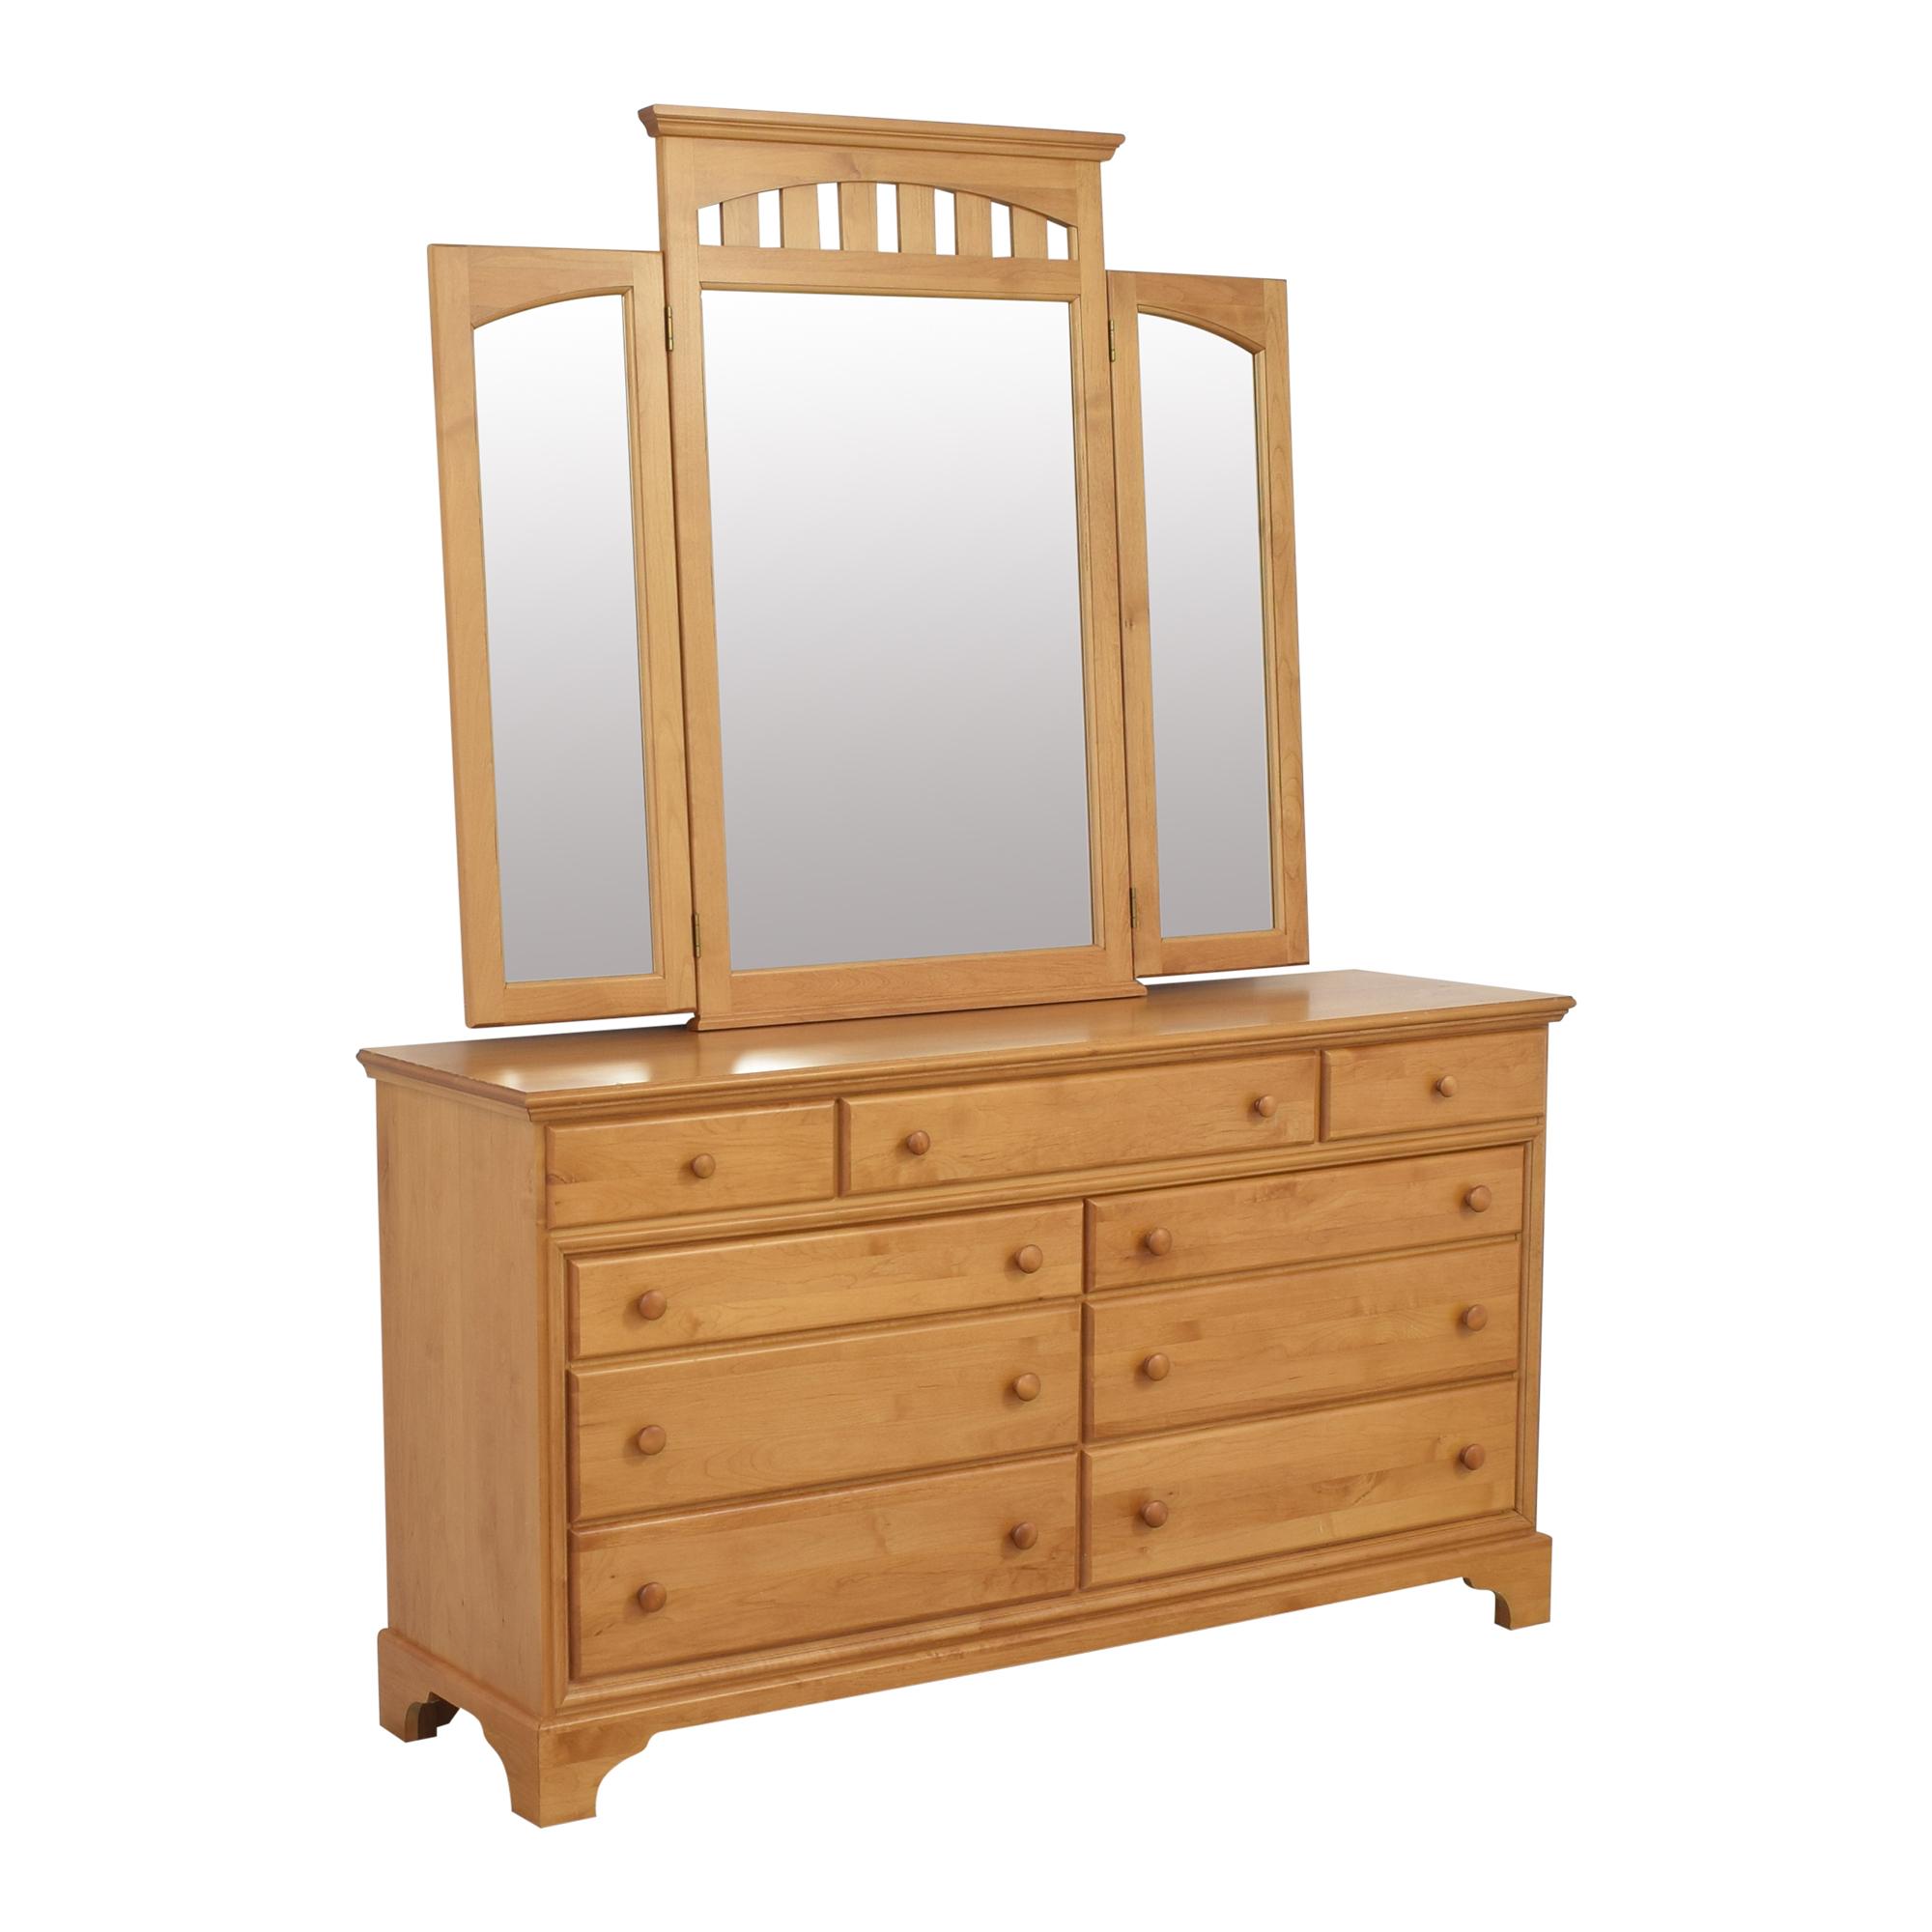 Nine Drawer Dresser with Trifold Mirror Dressers